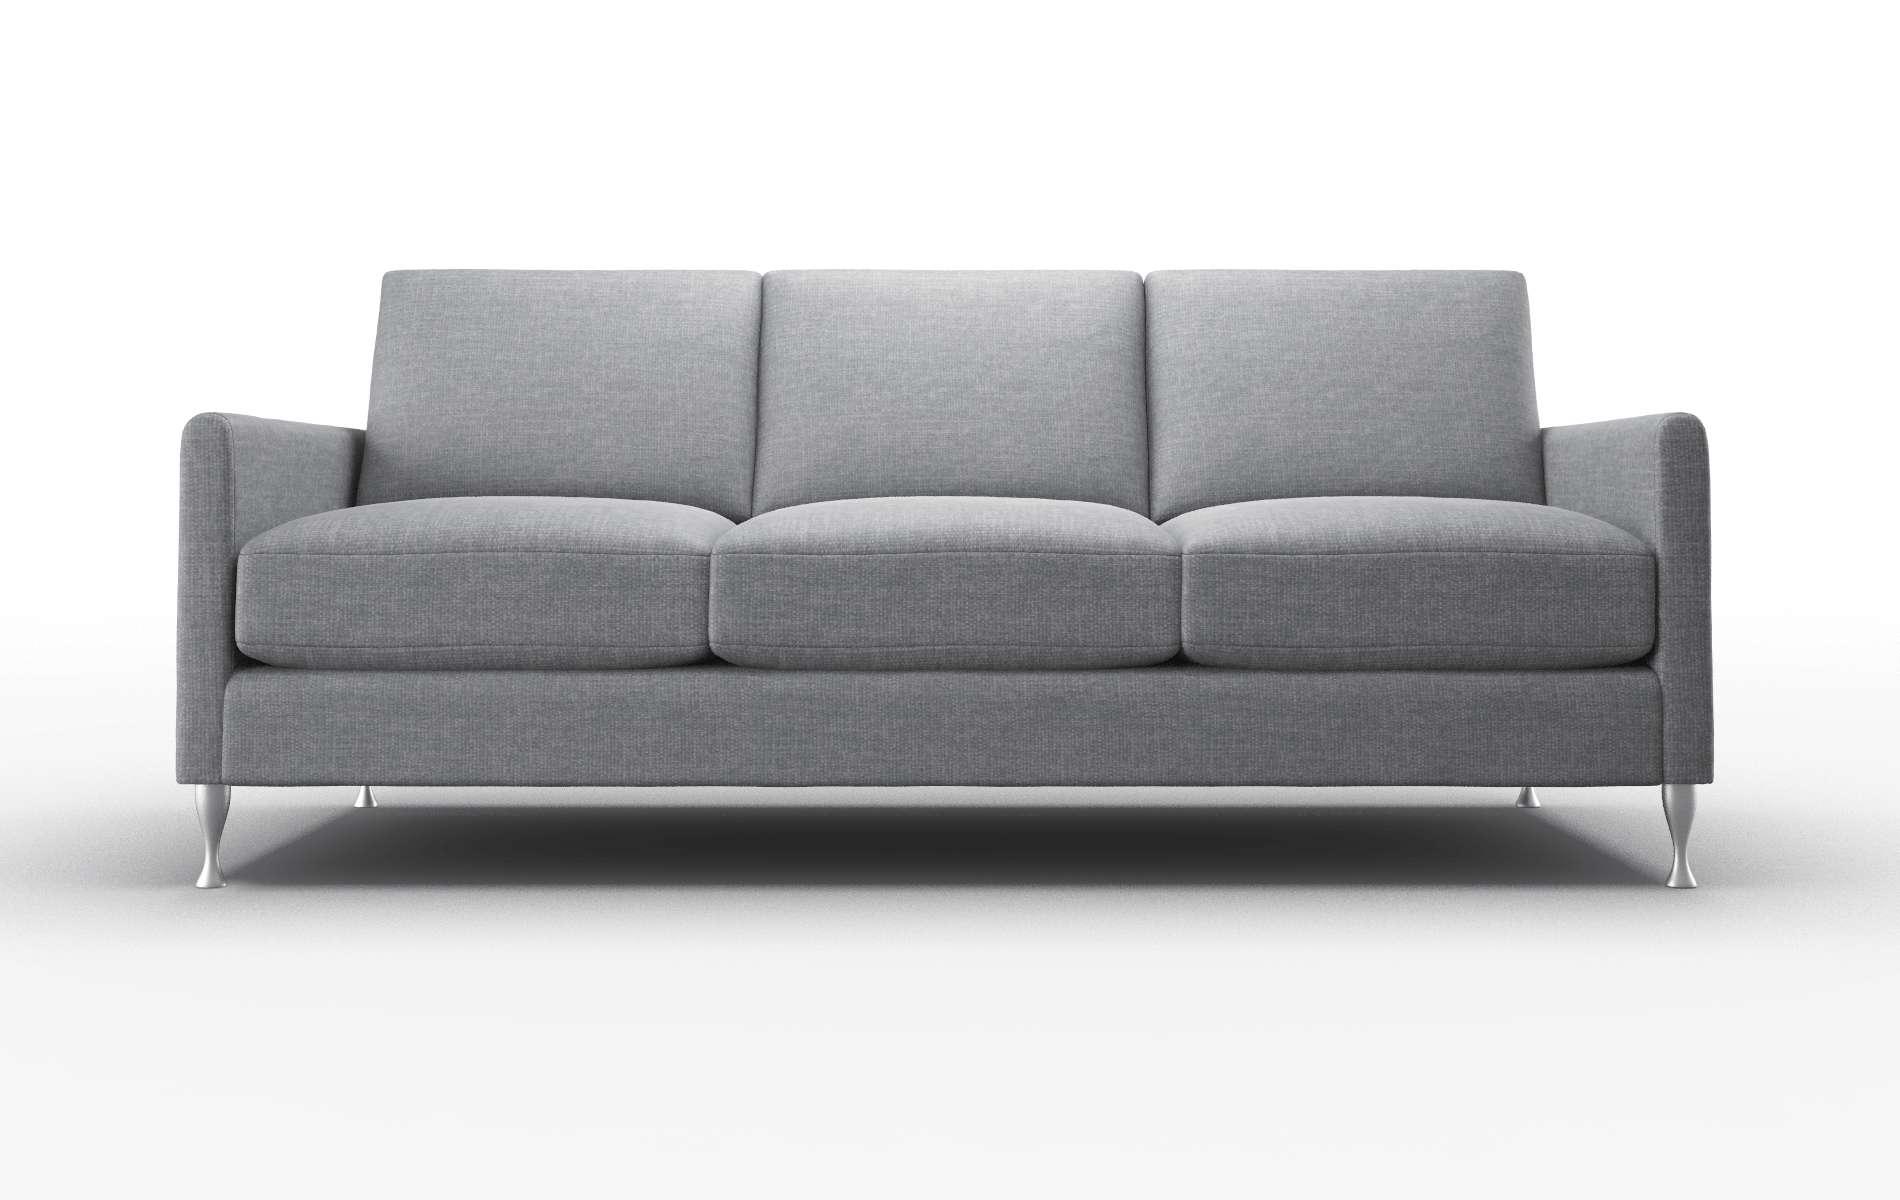 Eureka Keylargo Graphite Sofa metal legs 1